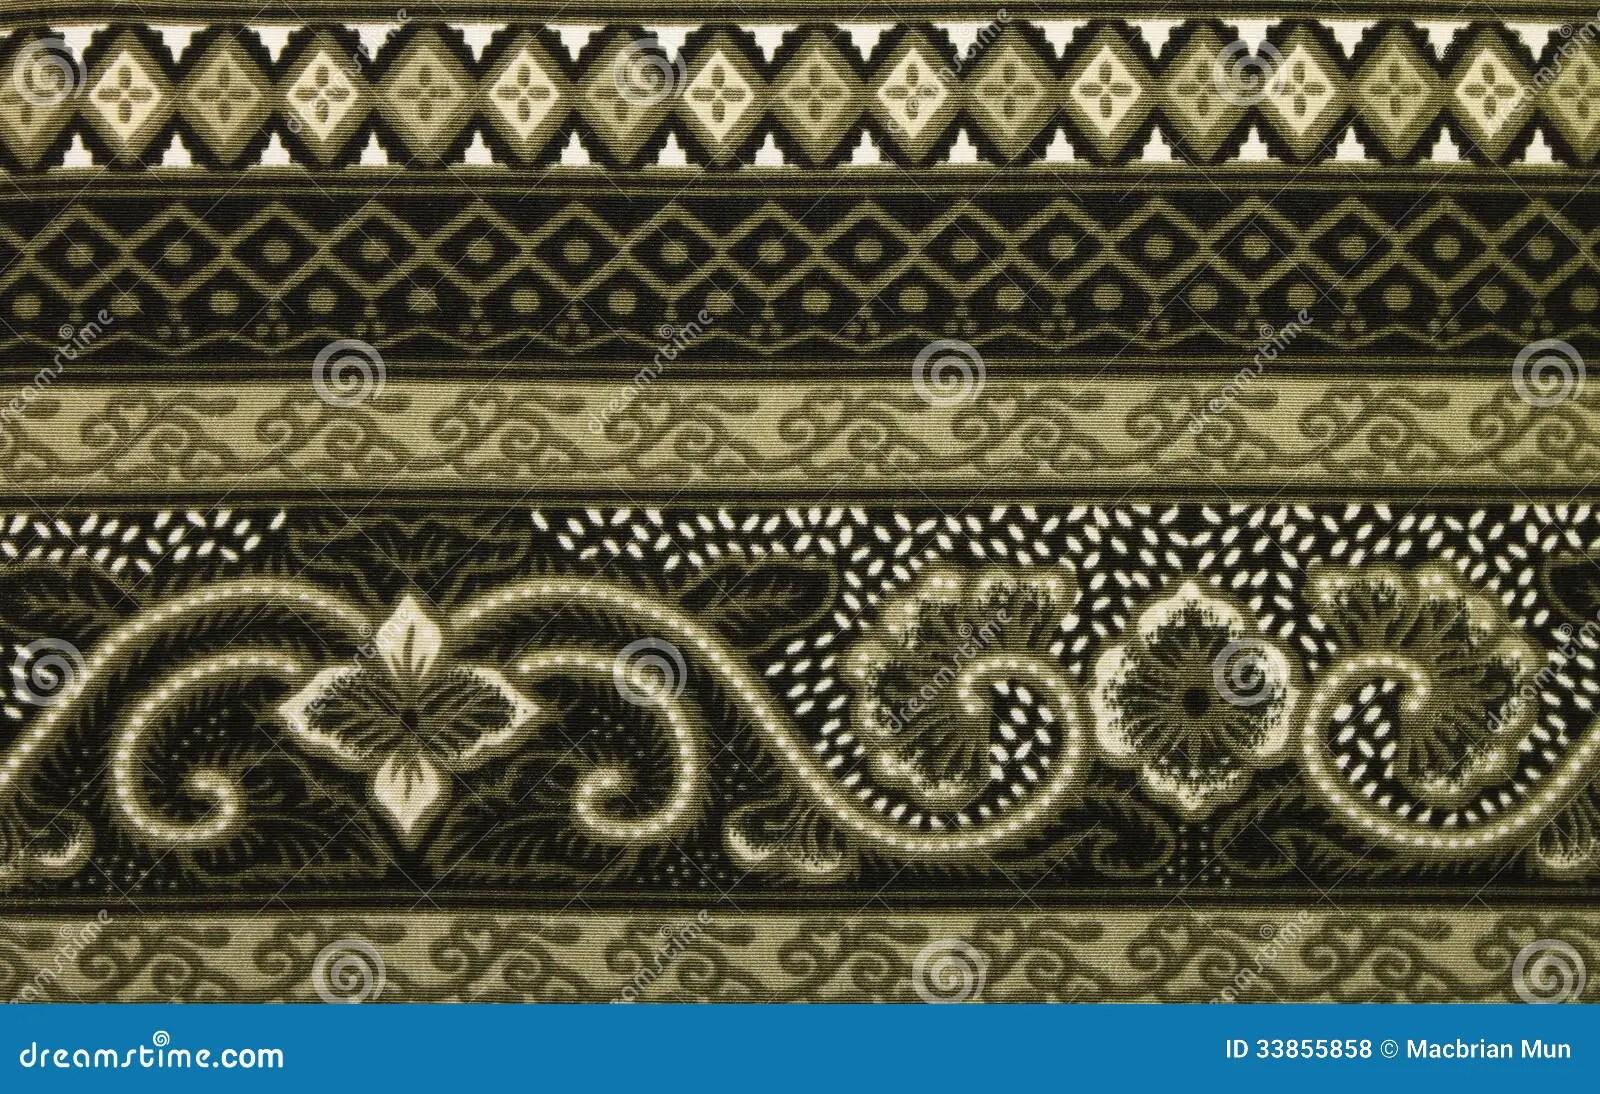 Traditional Batik Pattern Royalty Free Stock Photos Image 33855858